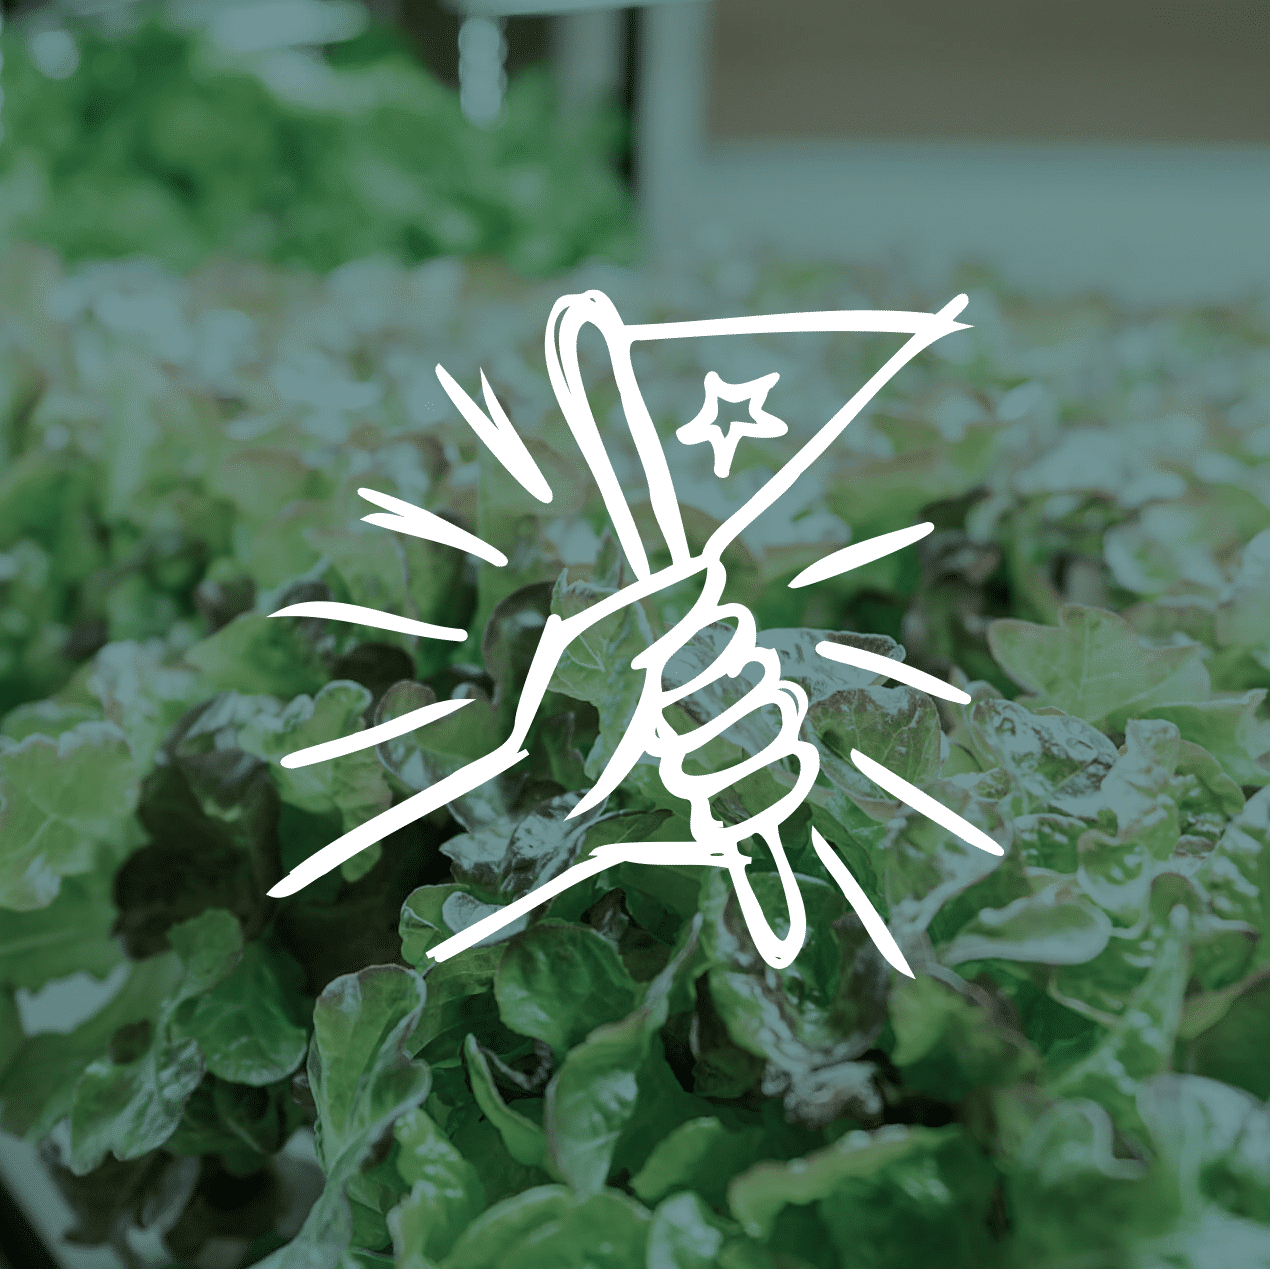 vireo support renew hydroponic garden